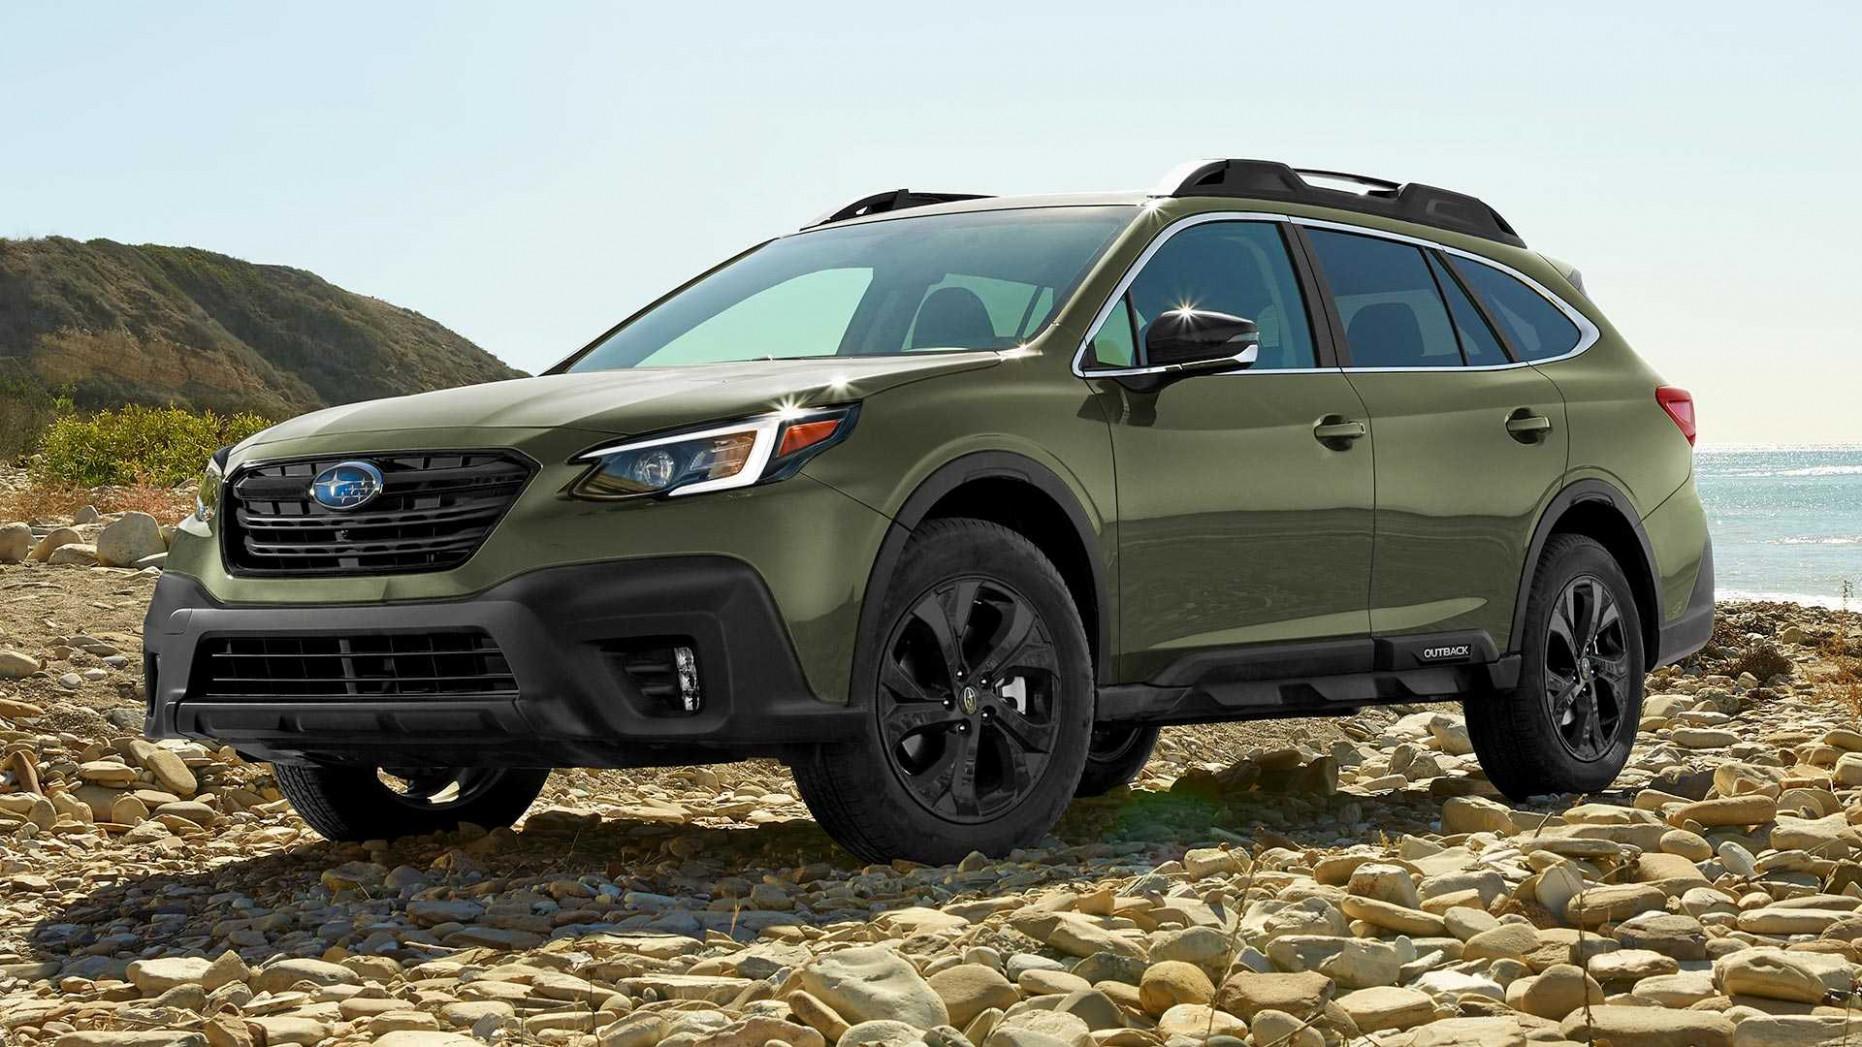 New Concept 2022 Subaru Outback Release Date